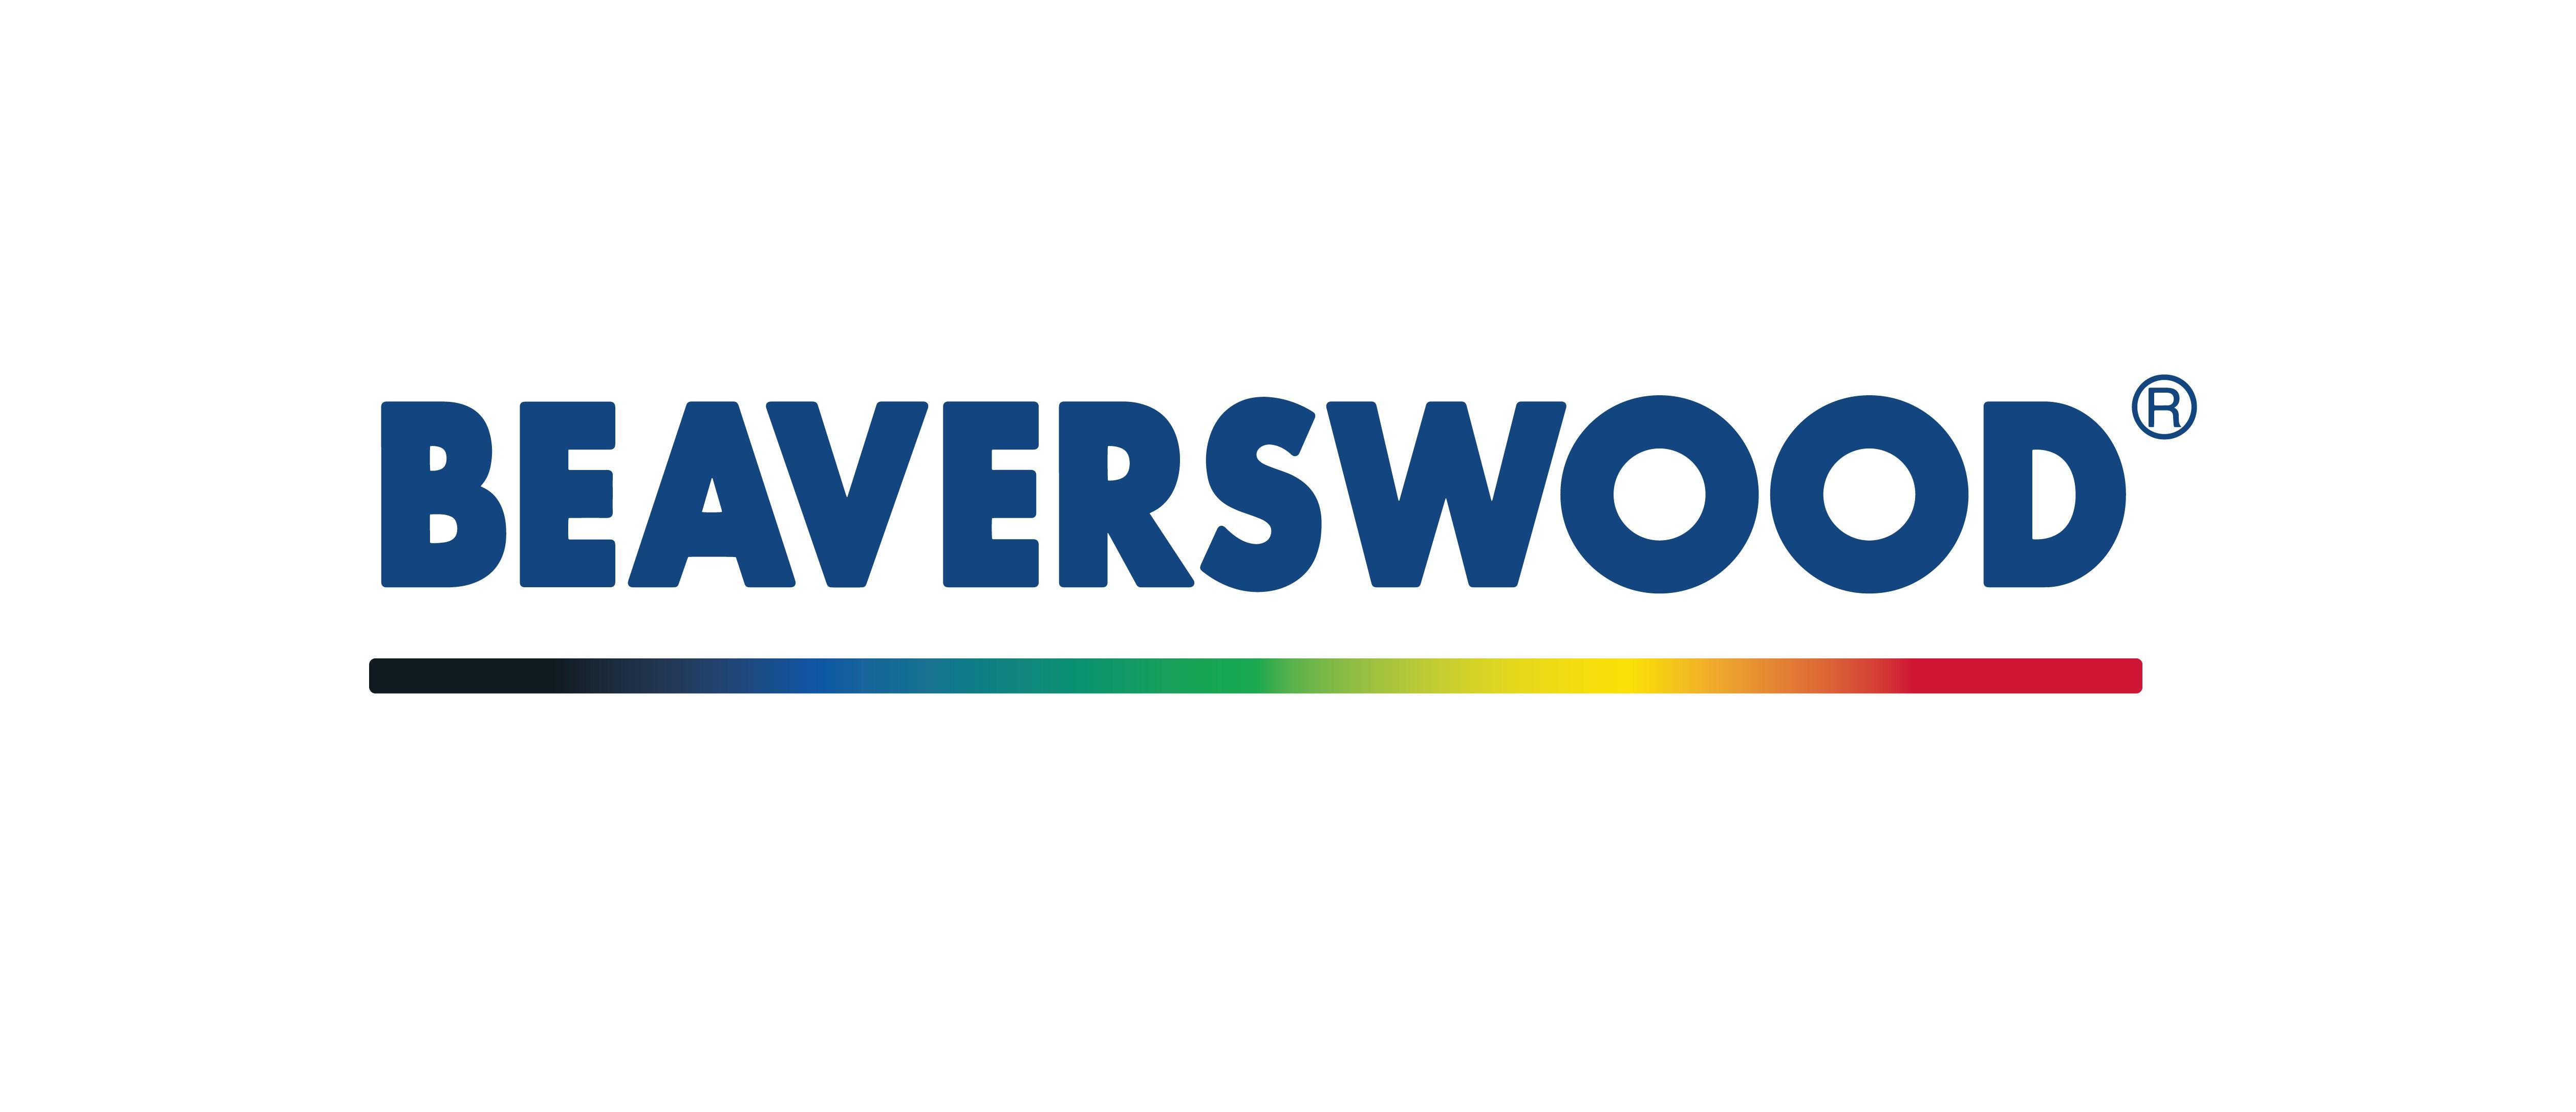 BEAVERSWOOD®